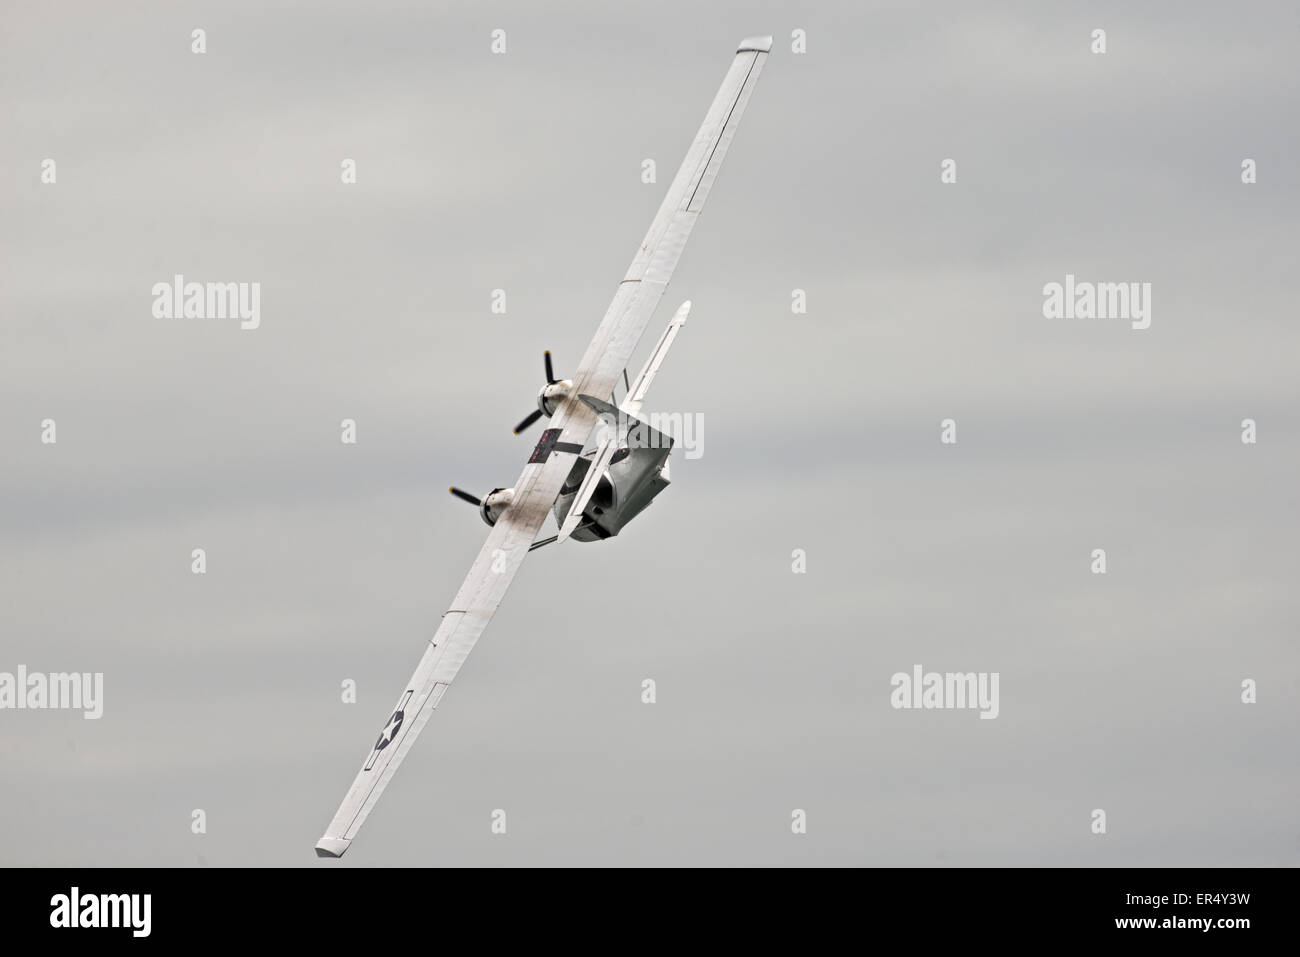 PBY Catalina C-FNJFFlying Boat Llandudno Air Show. N.Wales Uk Aerobatics Sea Plane - Stock Image